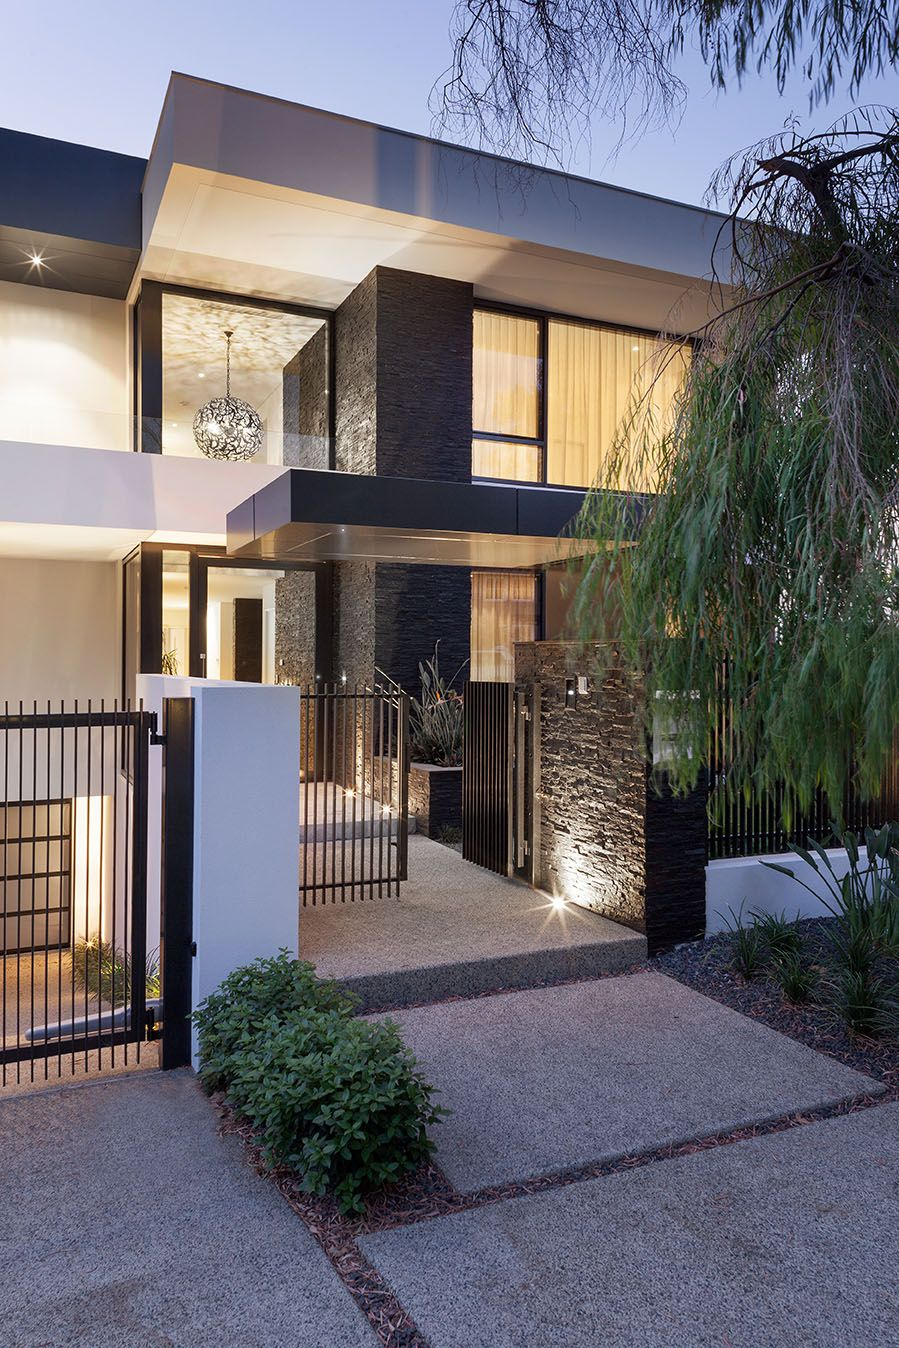 82f3dac2892ccd705e783ec8bad1609d Palm Springs Custom Home Plans on florida home plan, texas home plan, bakersfield home plan, altamonte home plan,